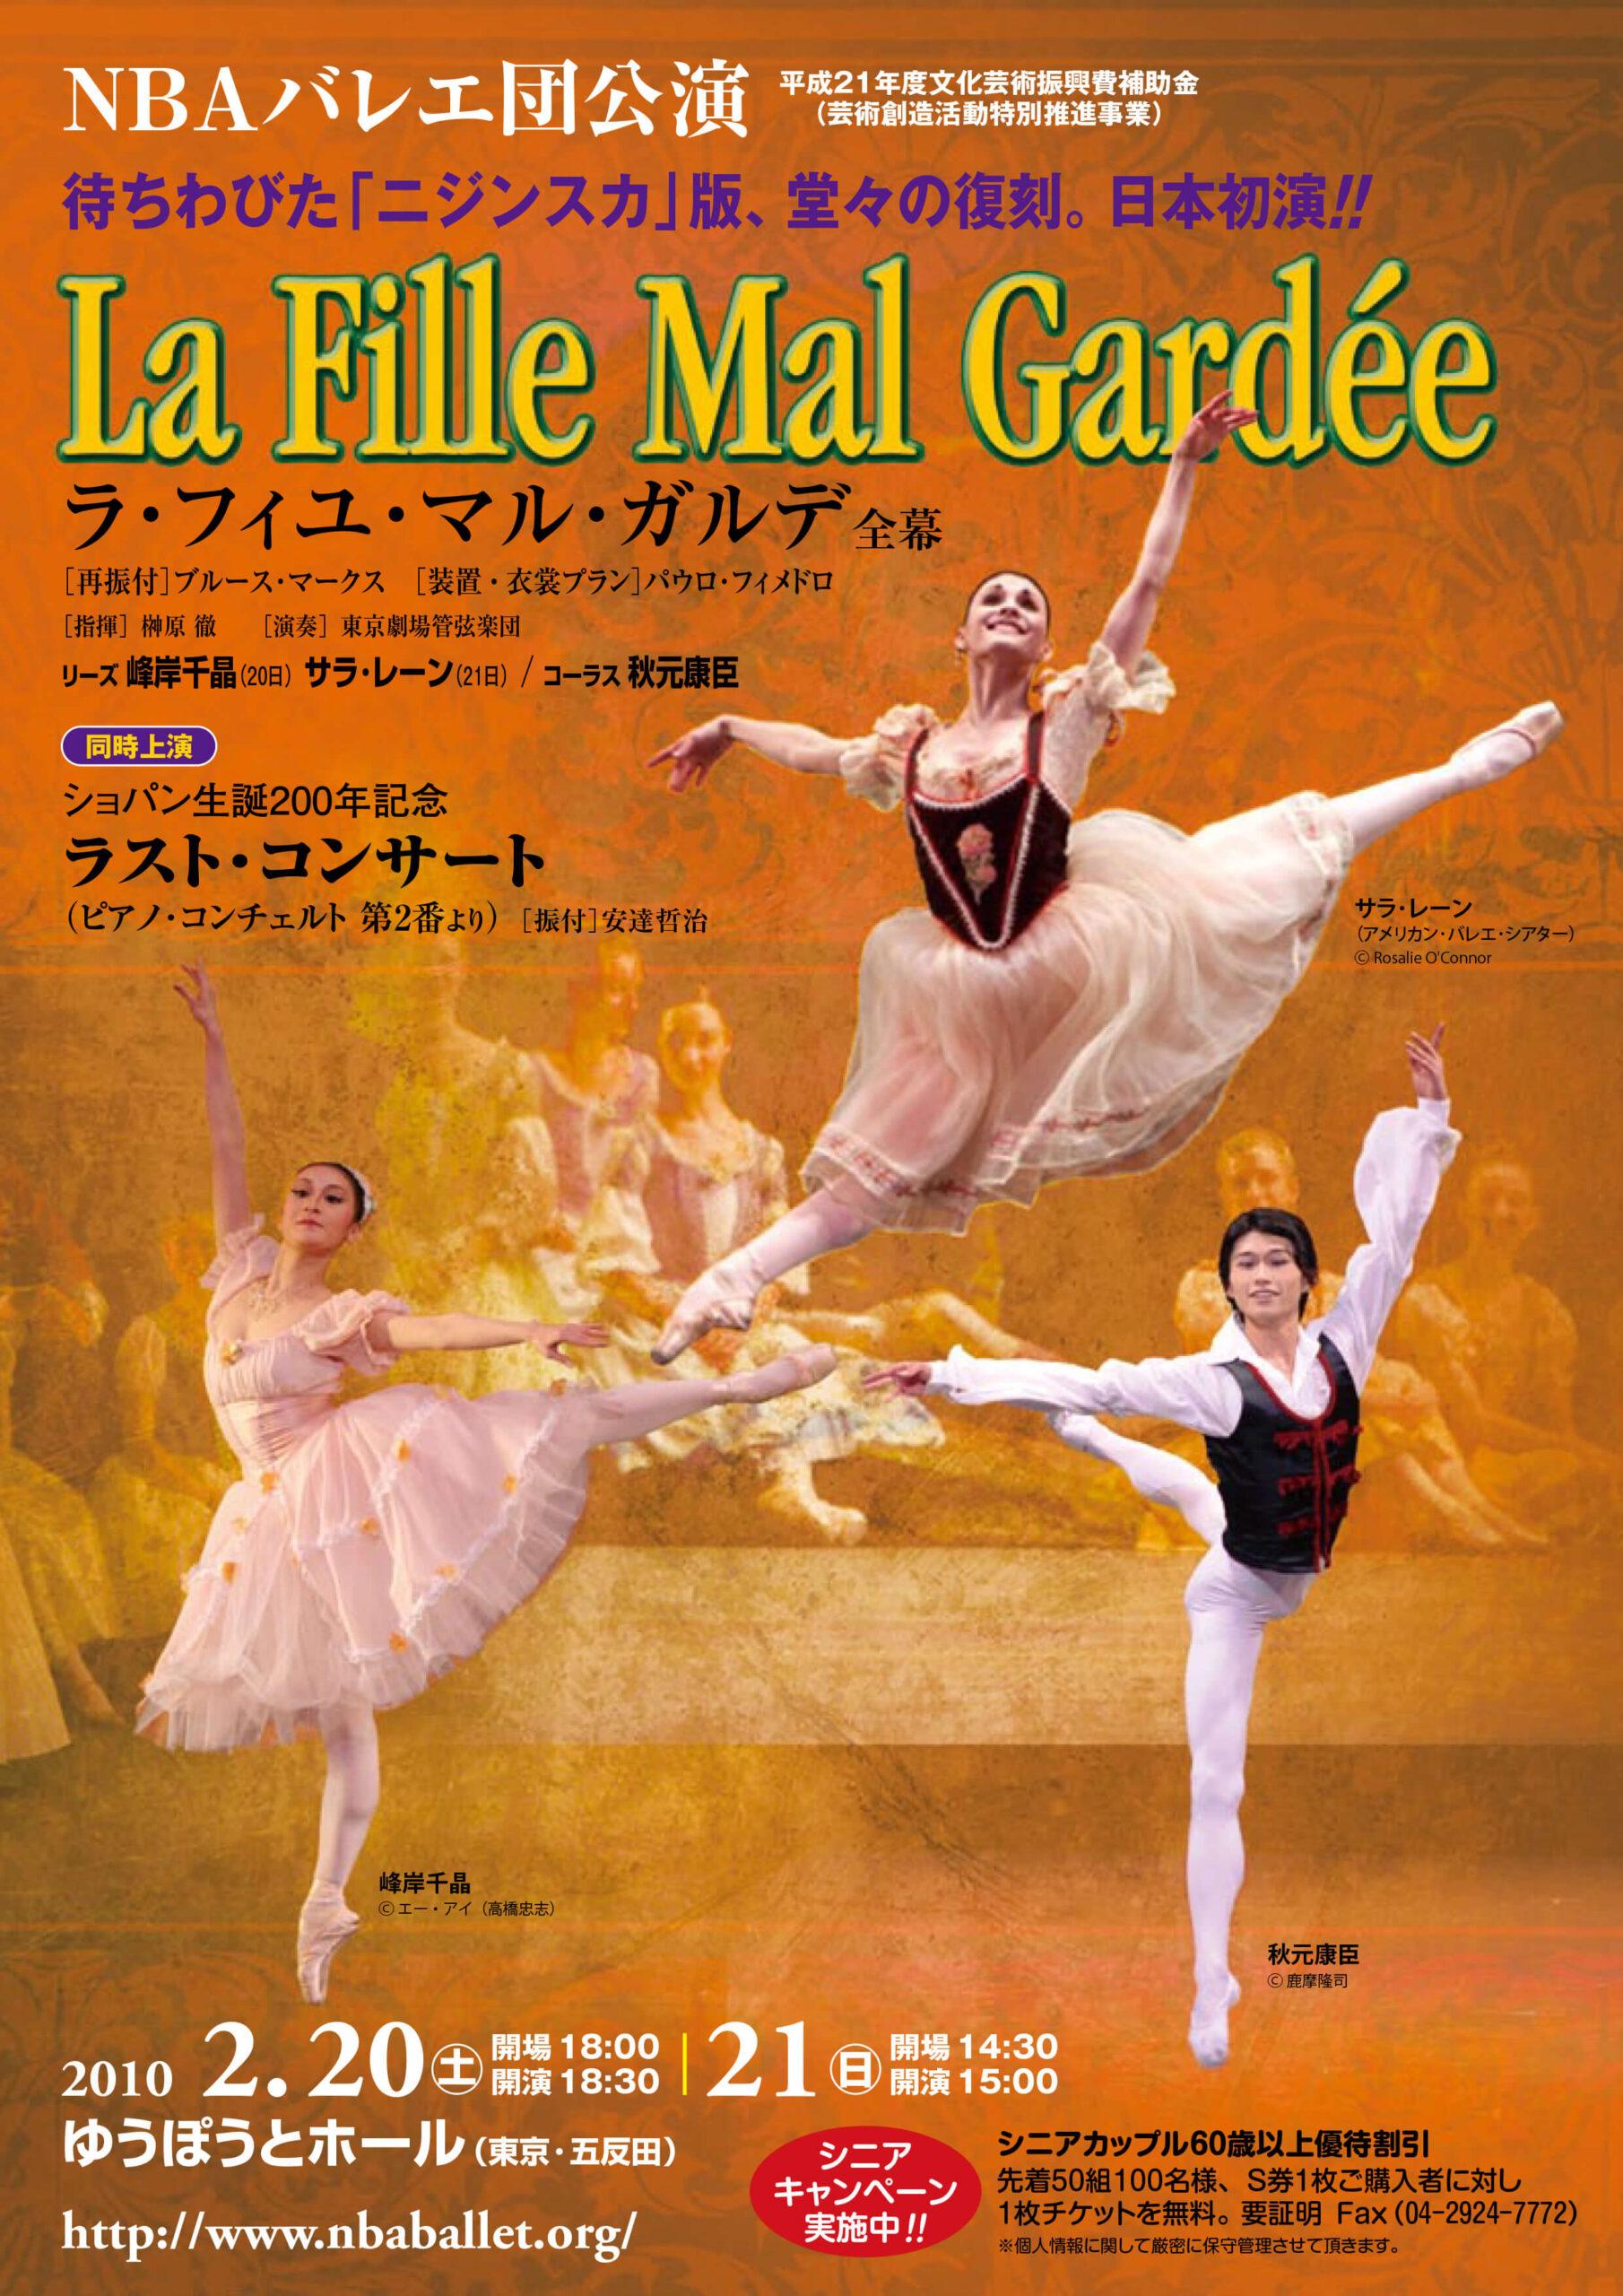 NBAバレエ団公演 La Fille Mal Gardee/ラストコンサート